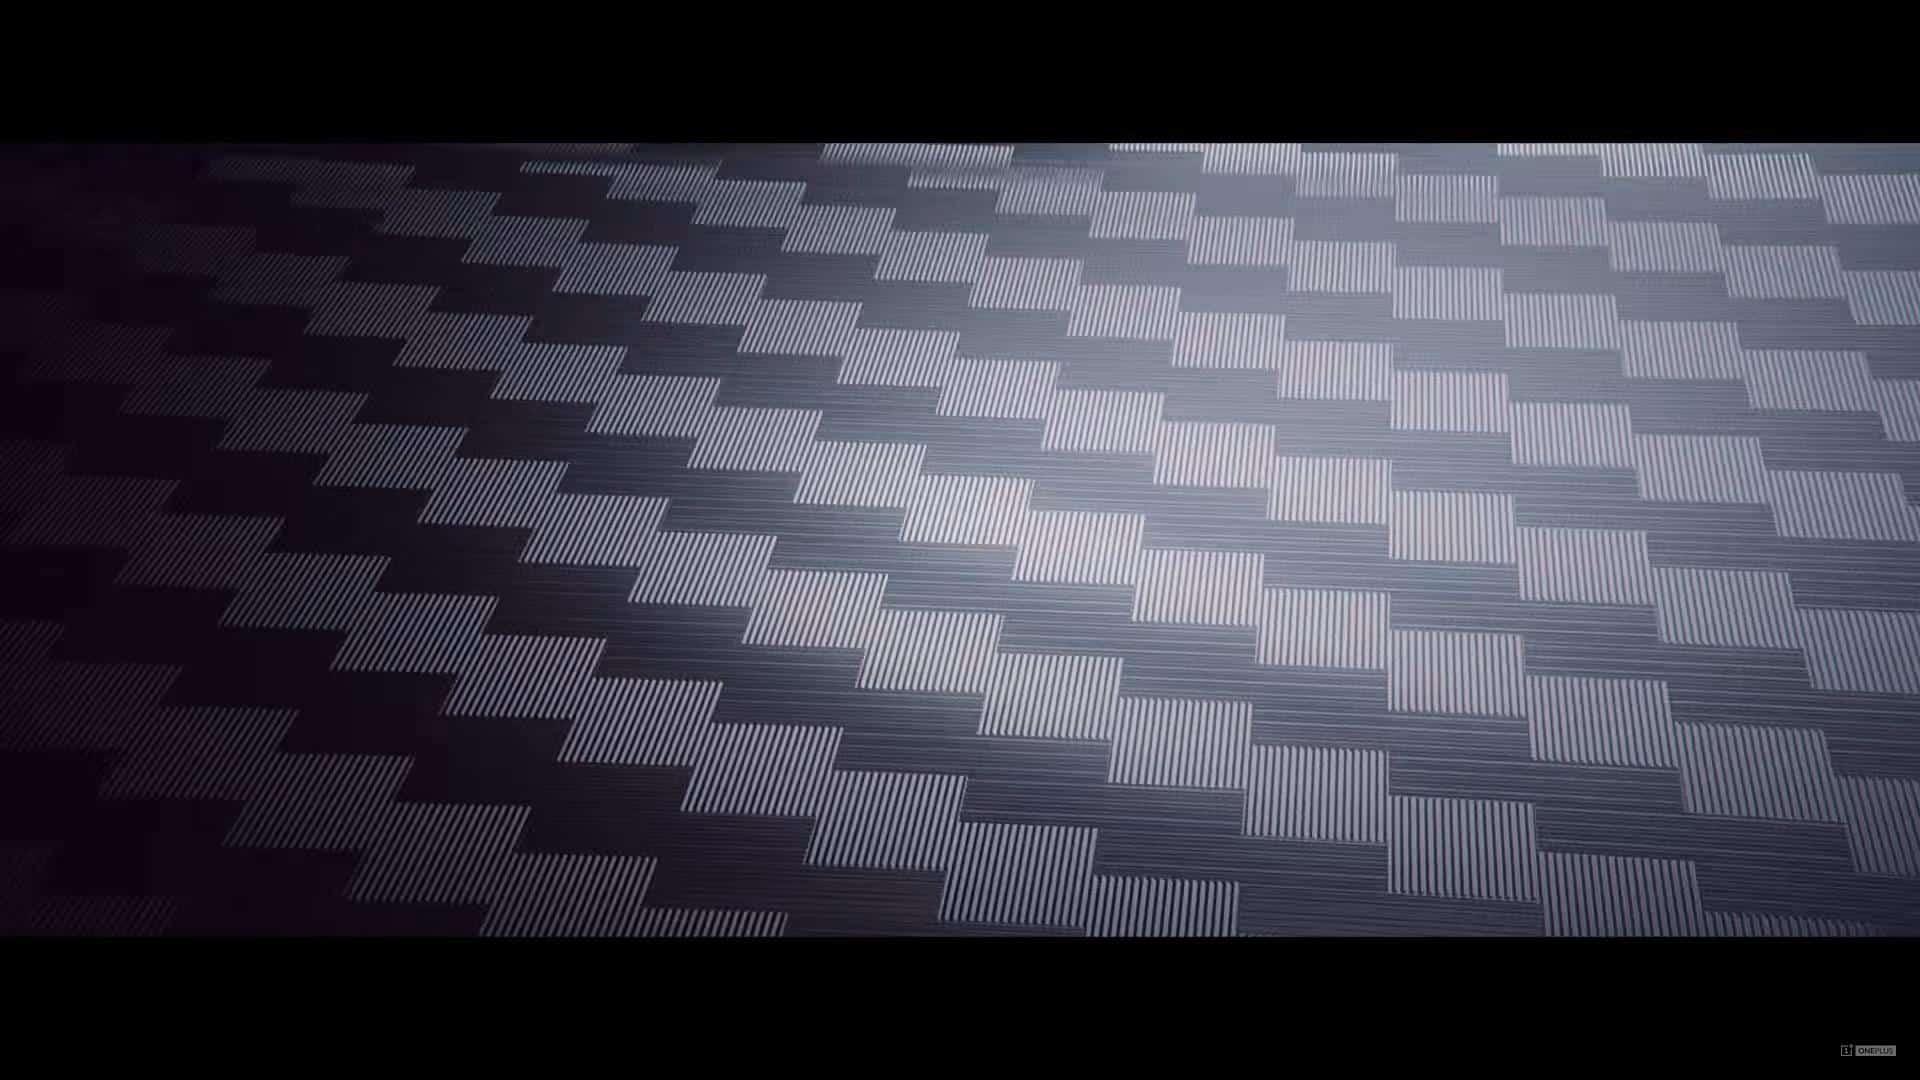 OnePlus 6 Avengers edition teaser 2